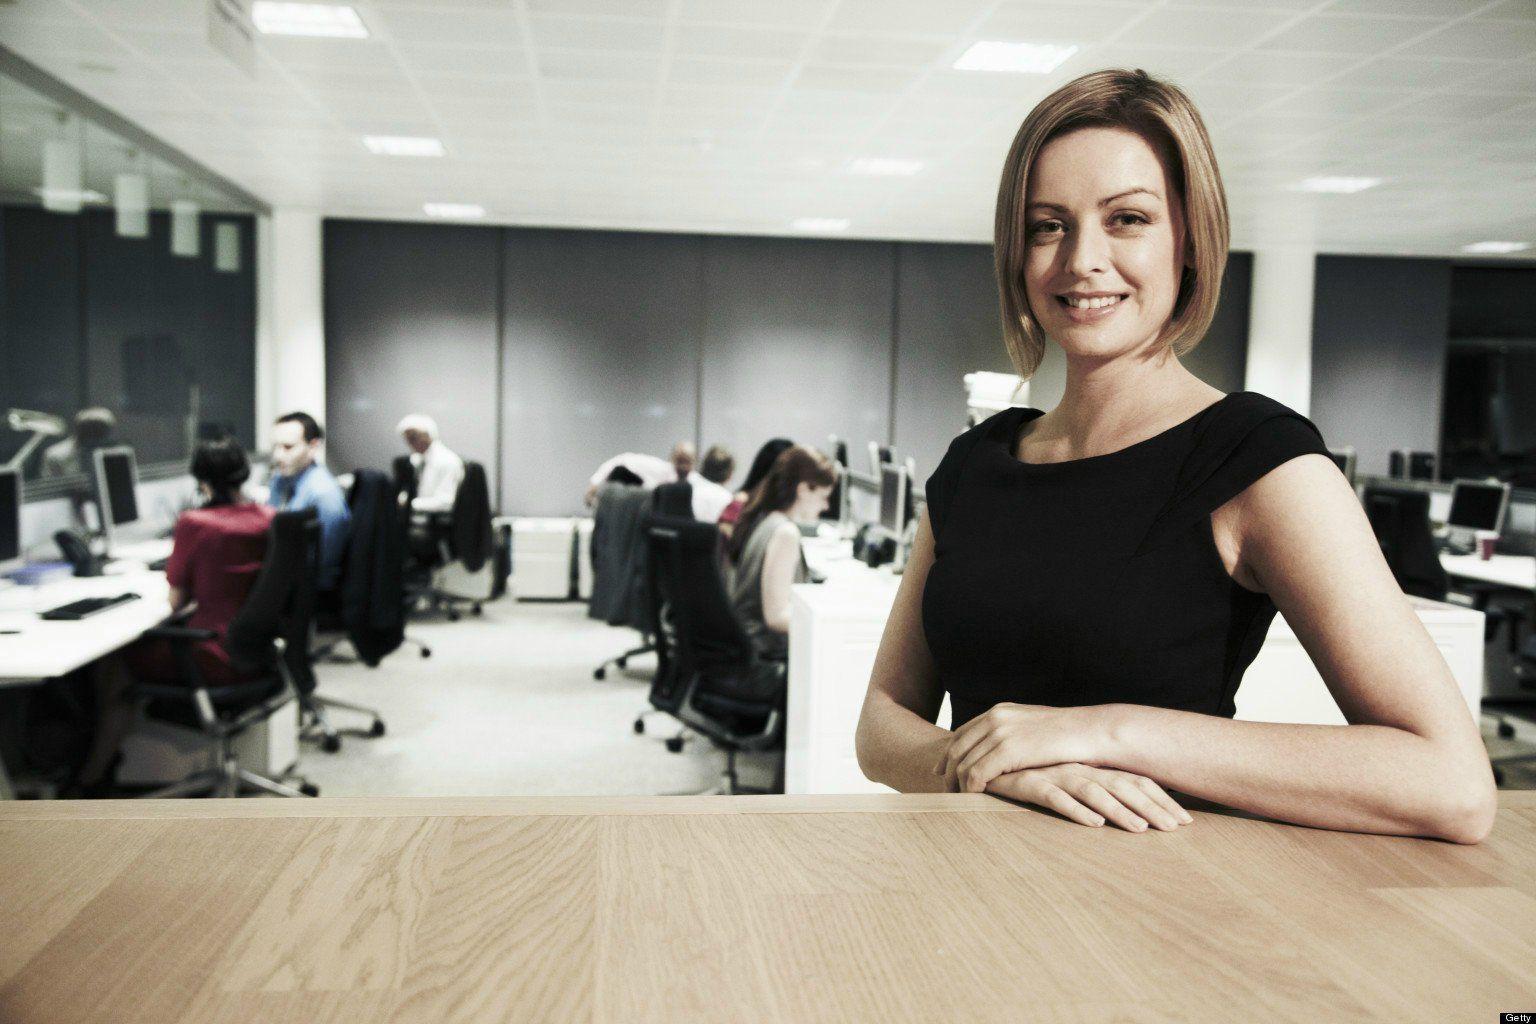 woman-business-woman (2)